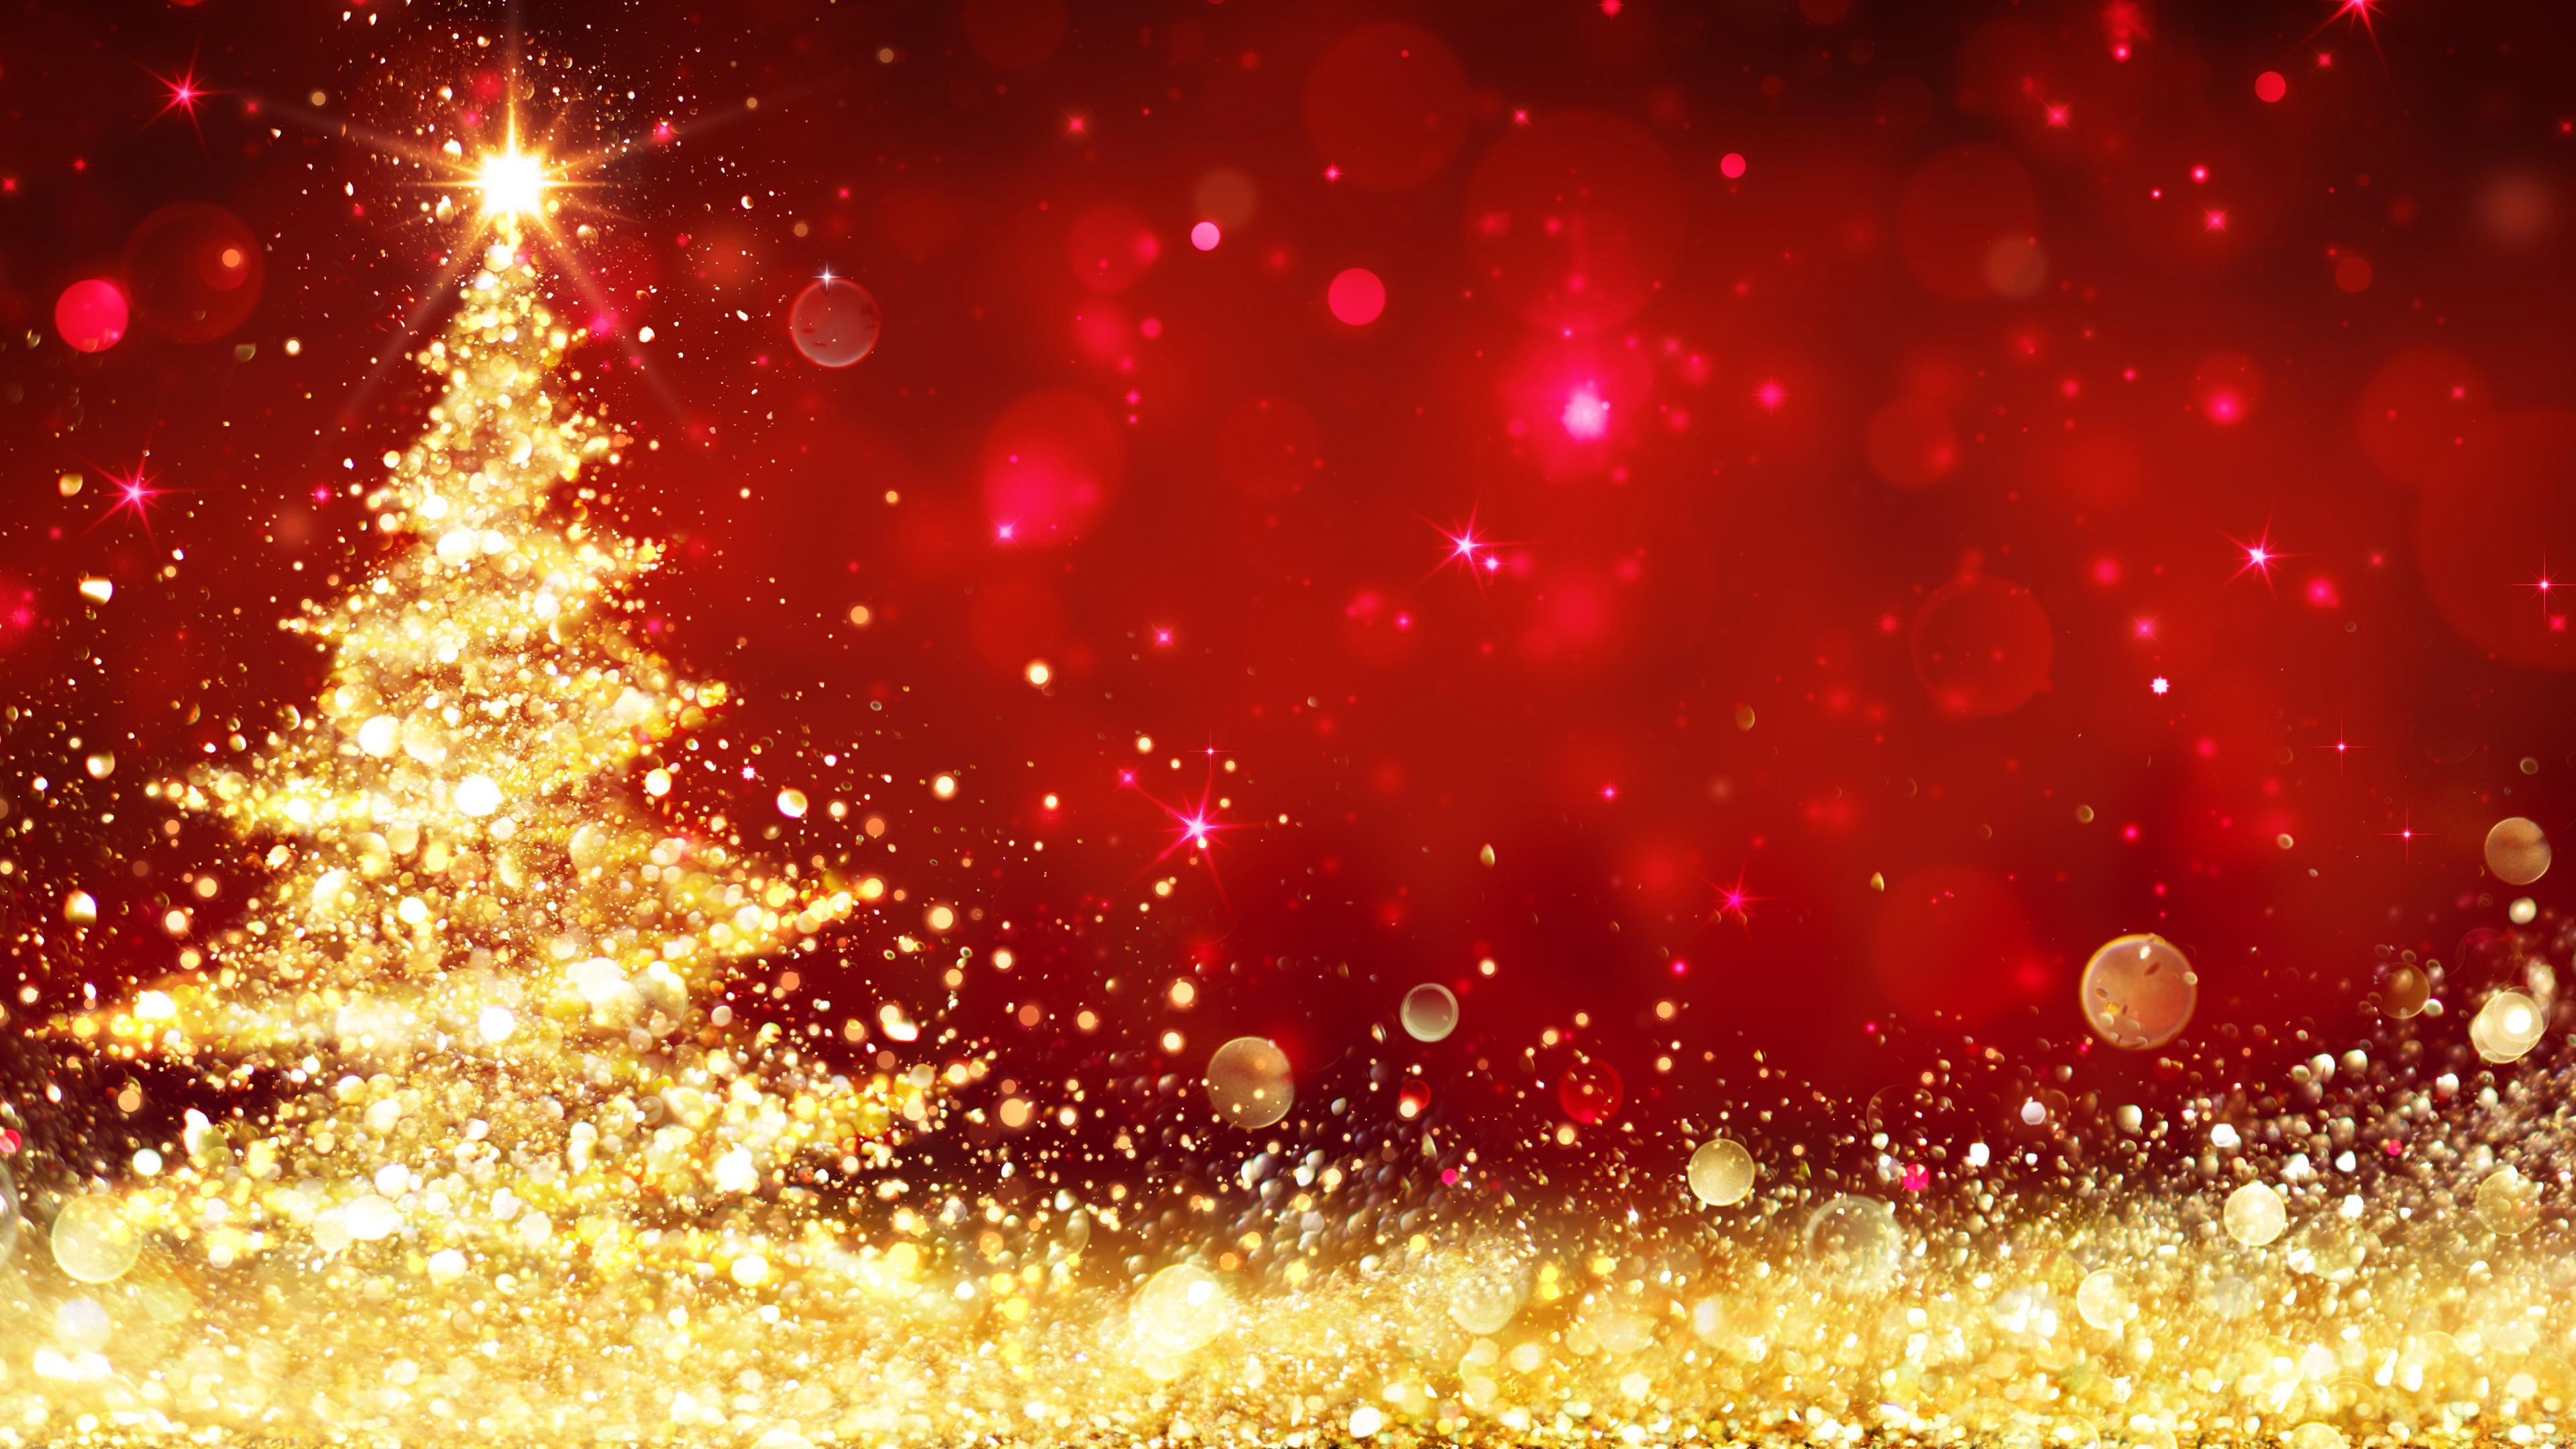 Merry Christmas Tree 4K Desktop HD Wallpaper Background 3840x2160